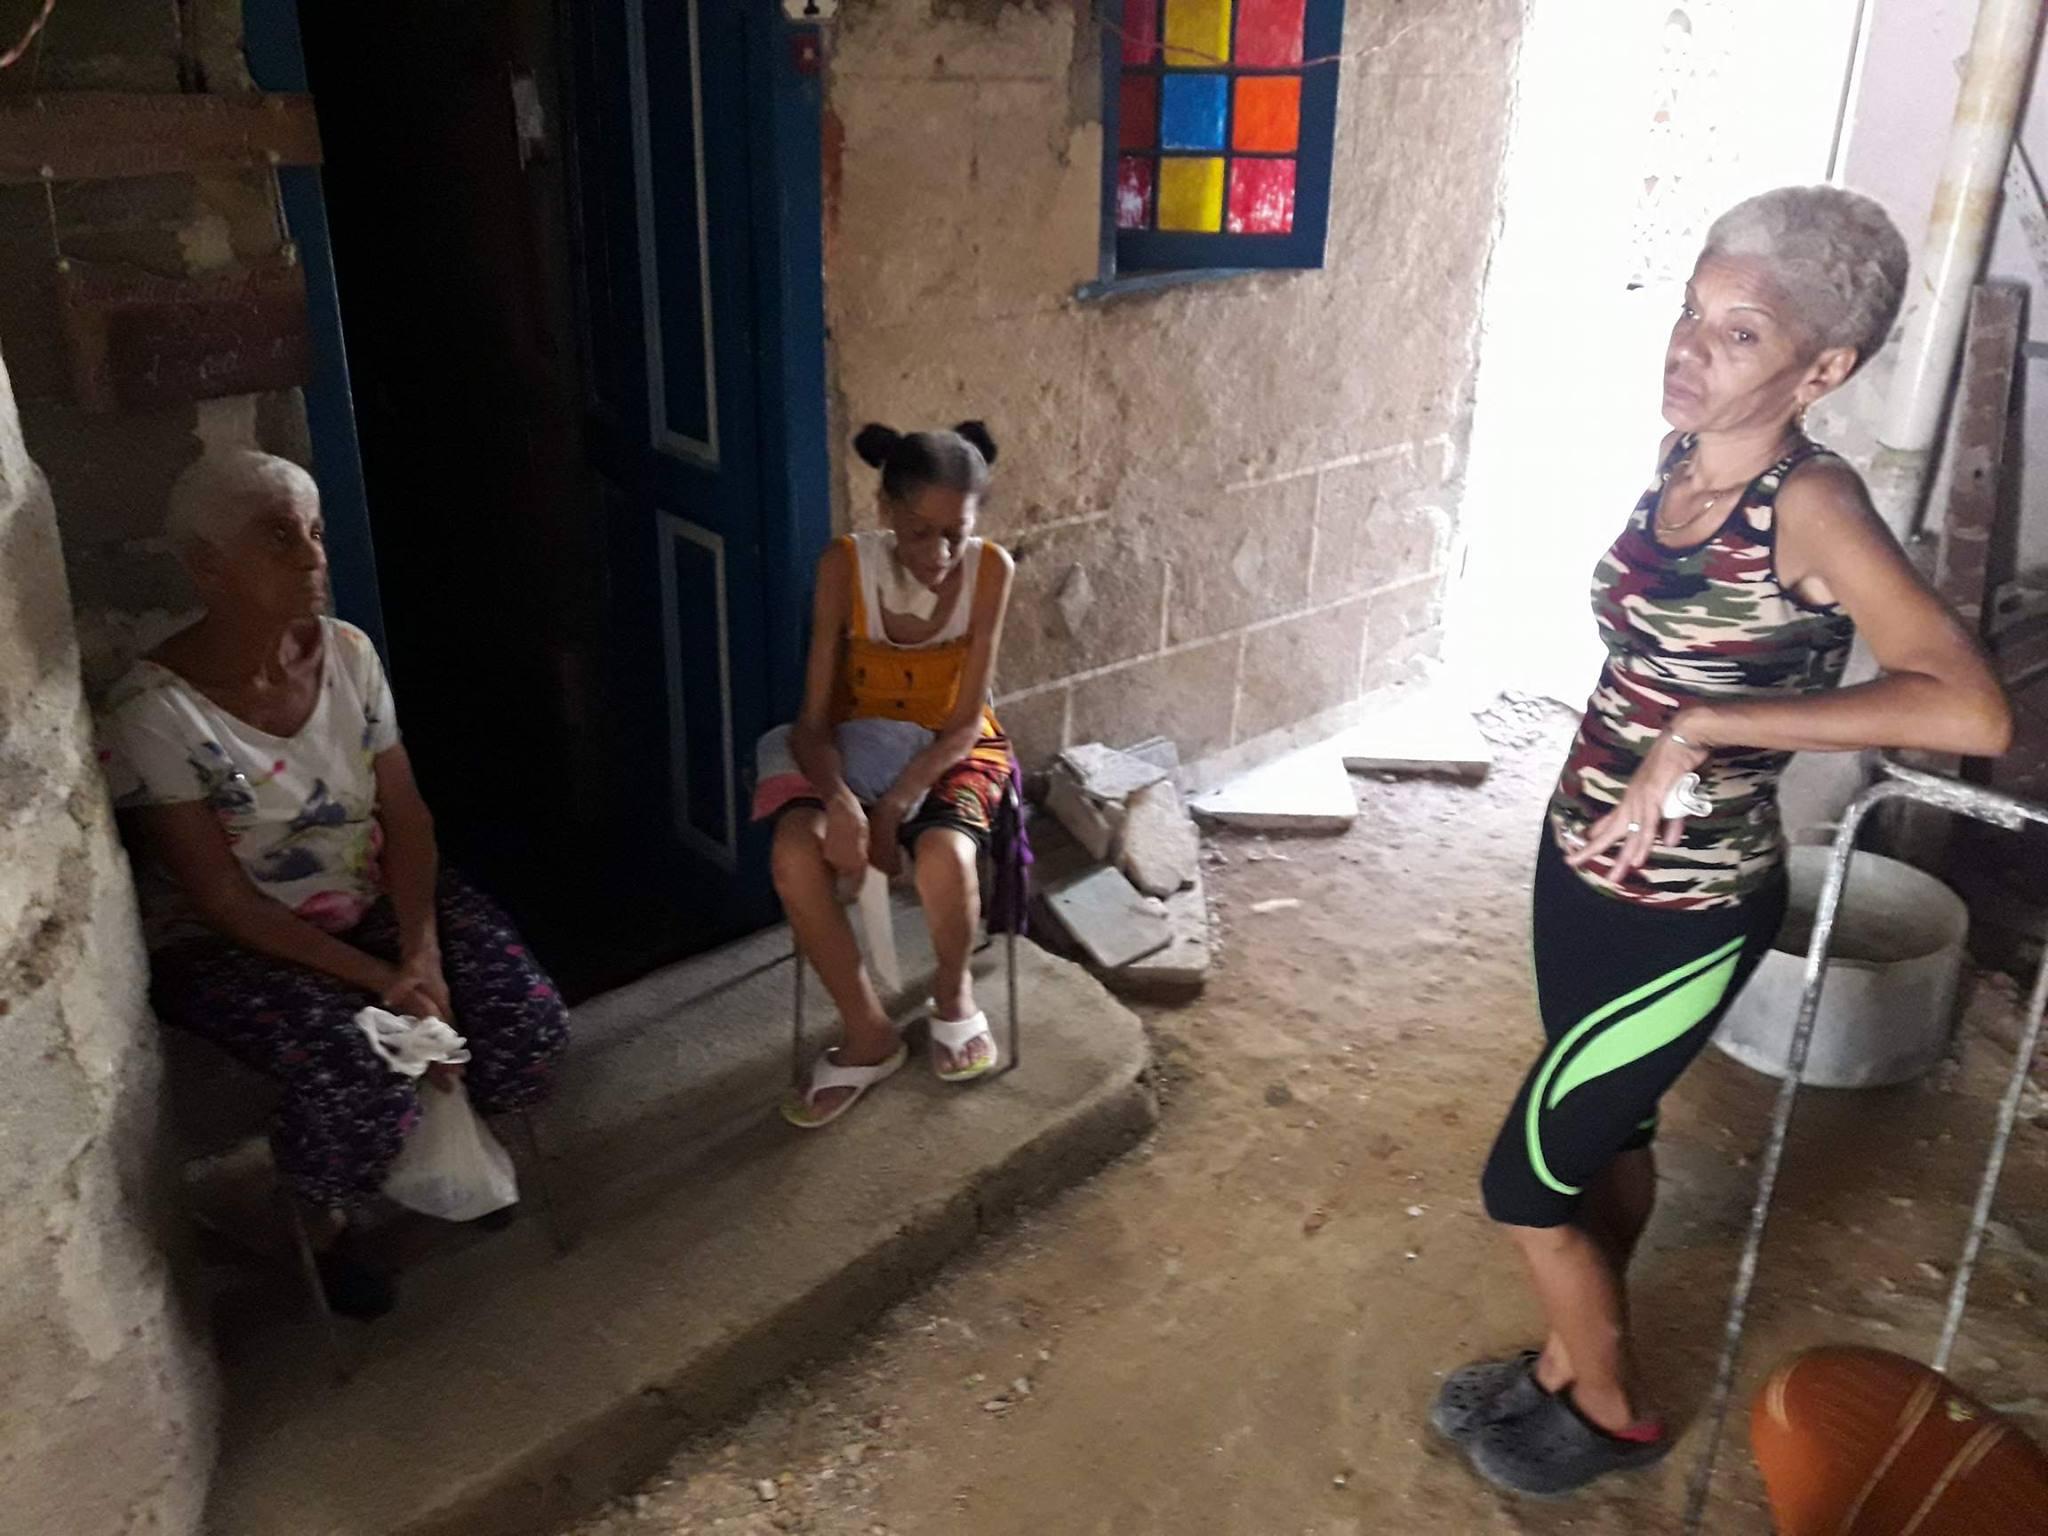 ecinos de Centro Habana / Foto: Abraham Jiménez